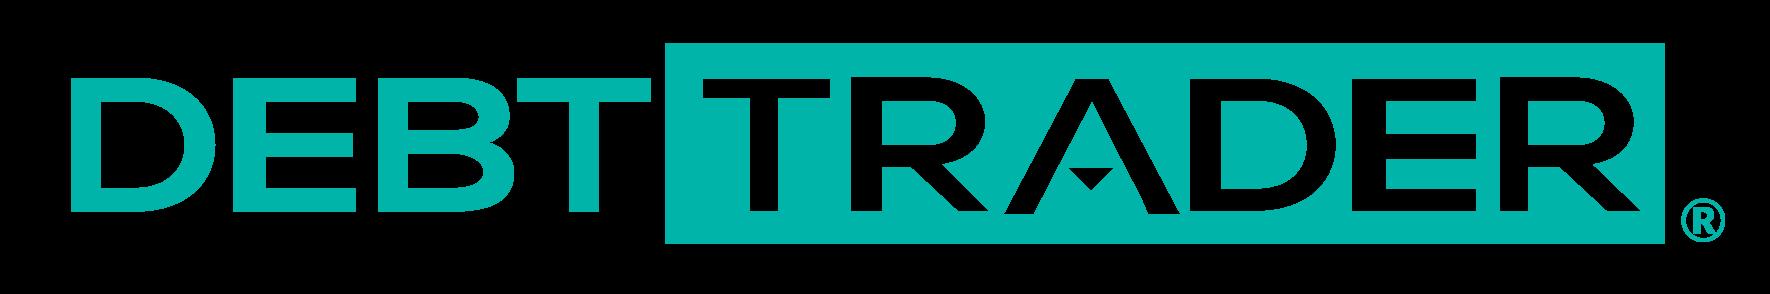 DebtTrader logo.png